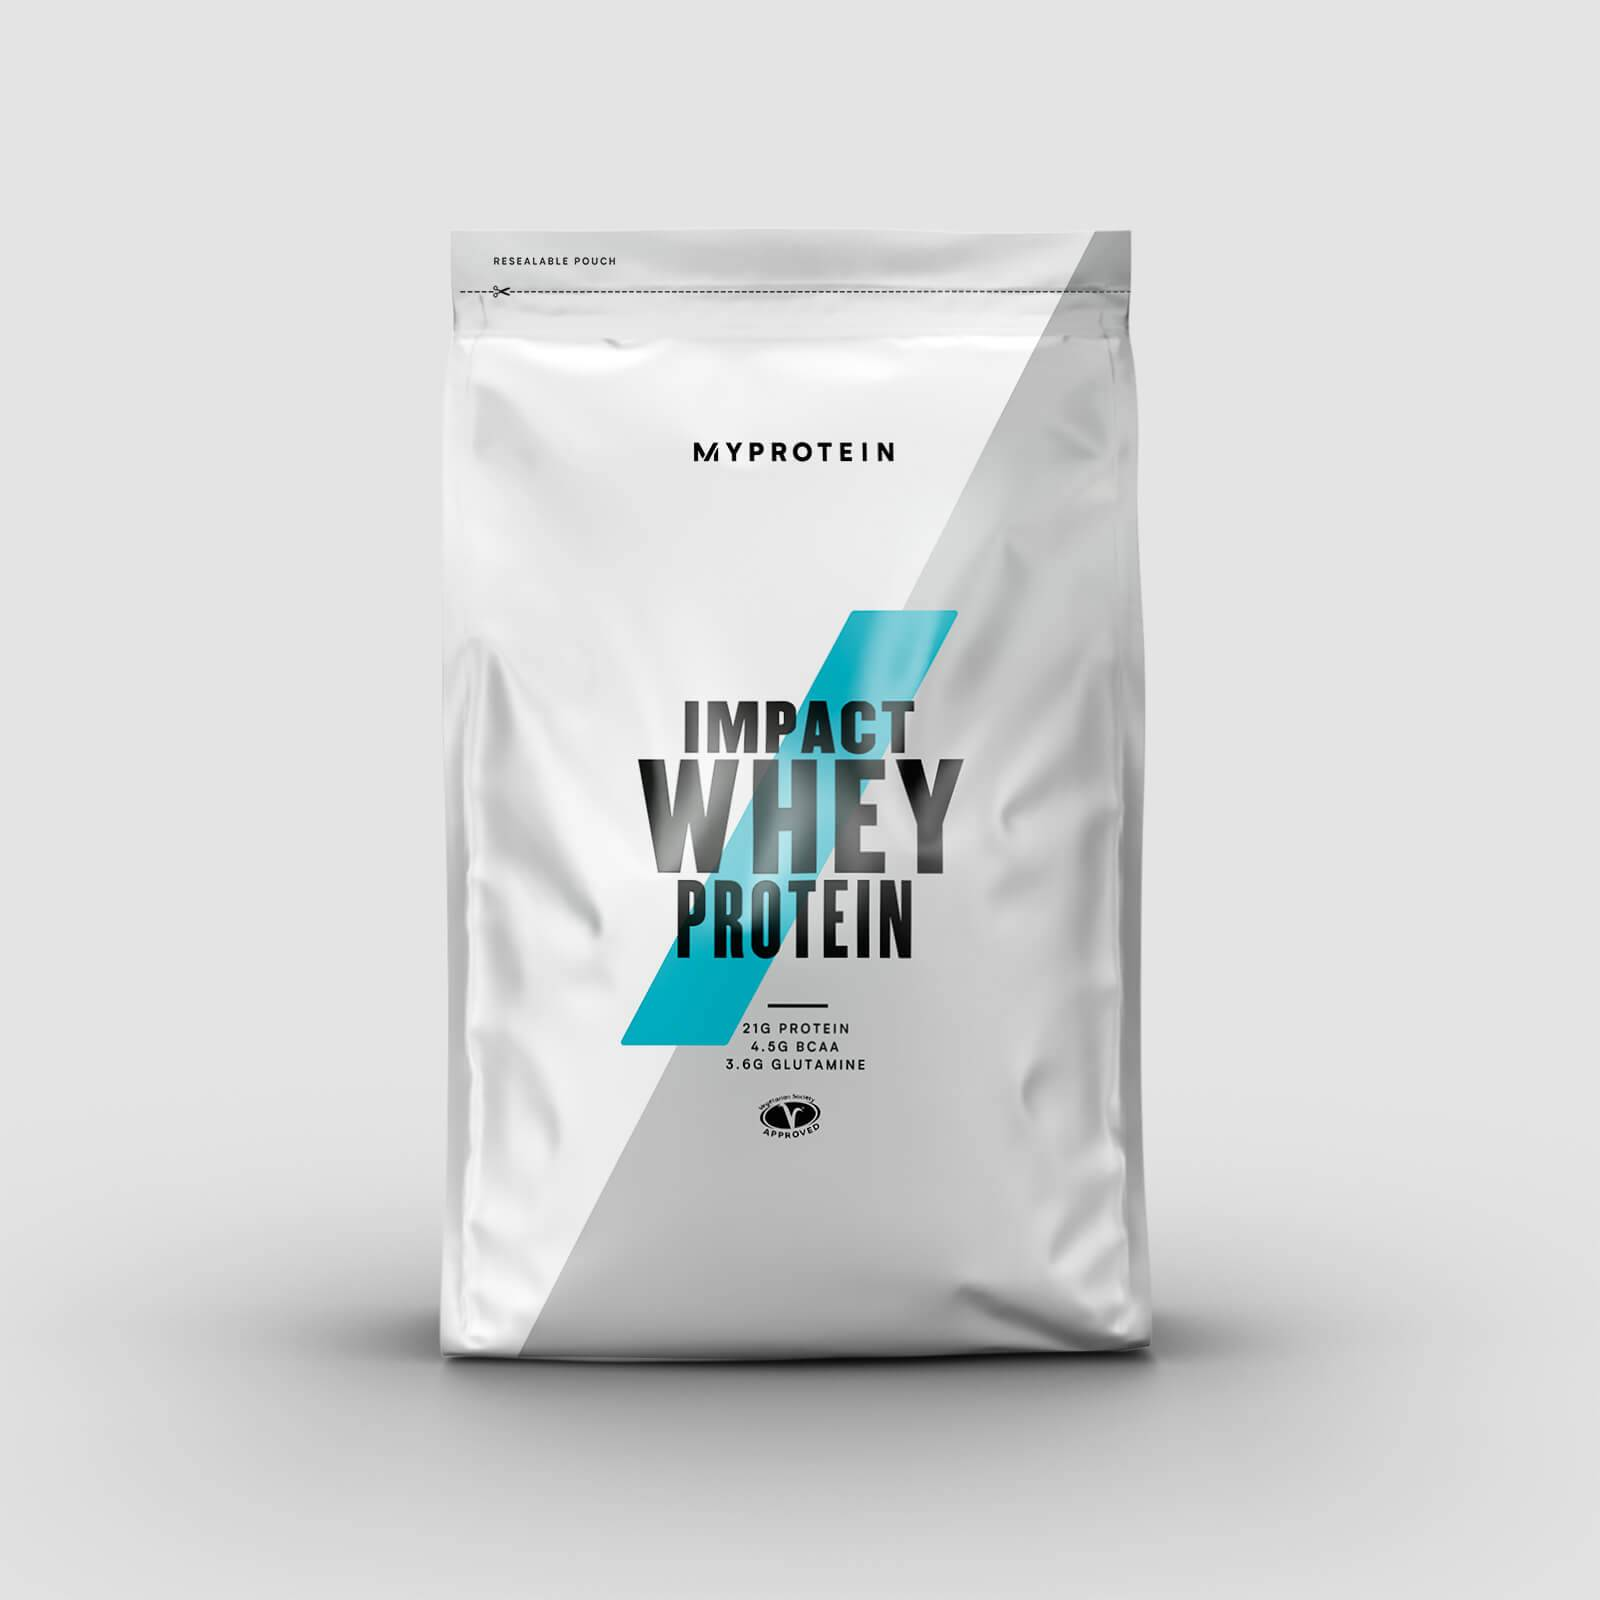 Myprotein Impact Whey Protein - 2.5kg - Noix De Coco